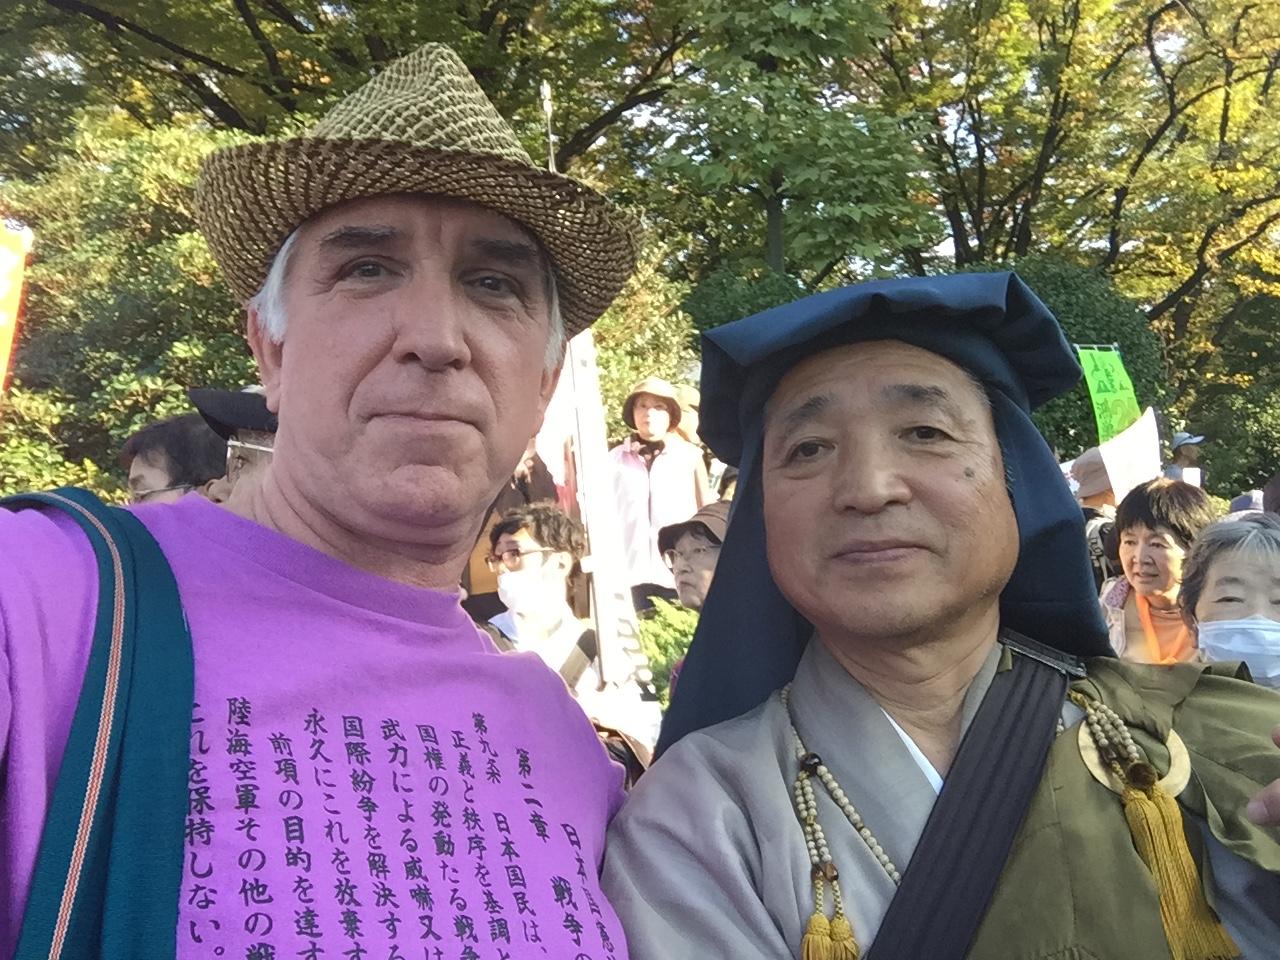 Japan_Jeff_Mensendiek_IMG_0386.jpeg